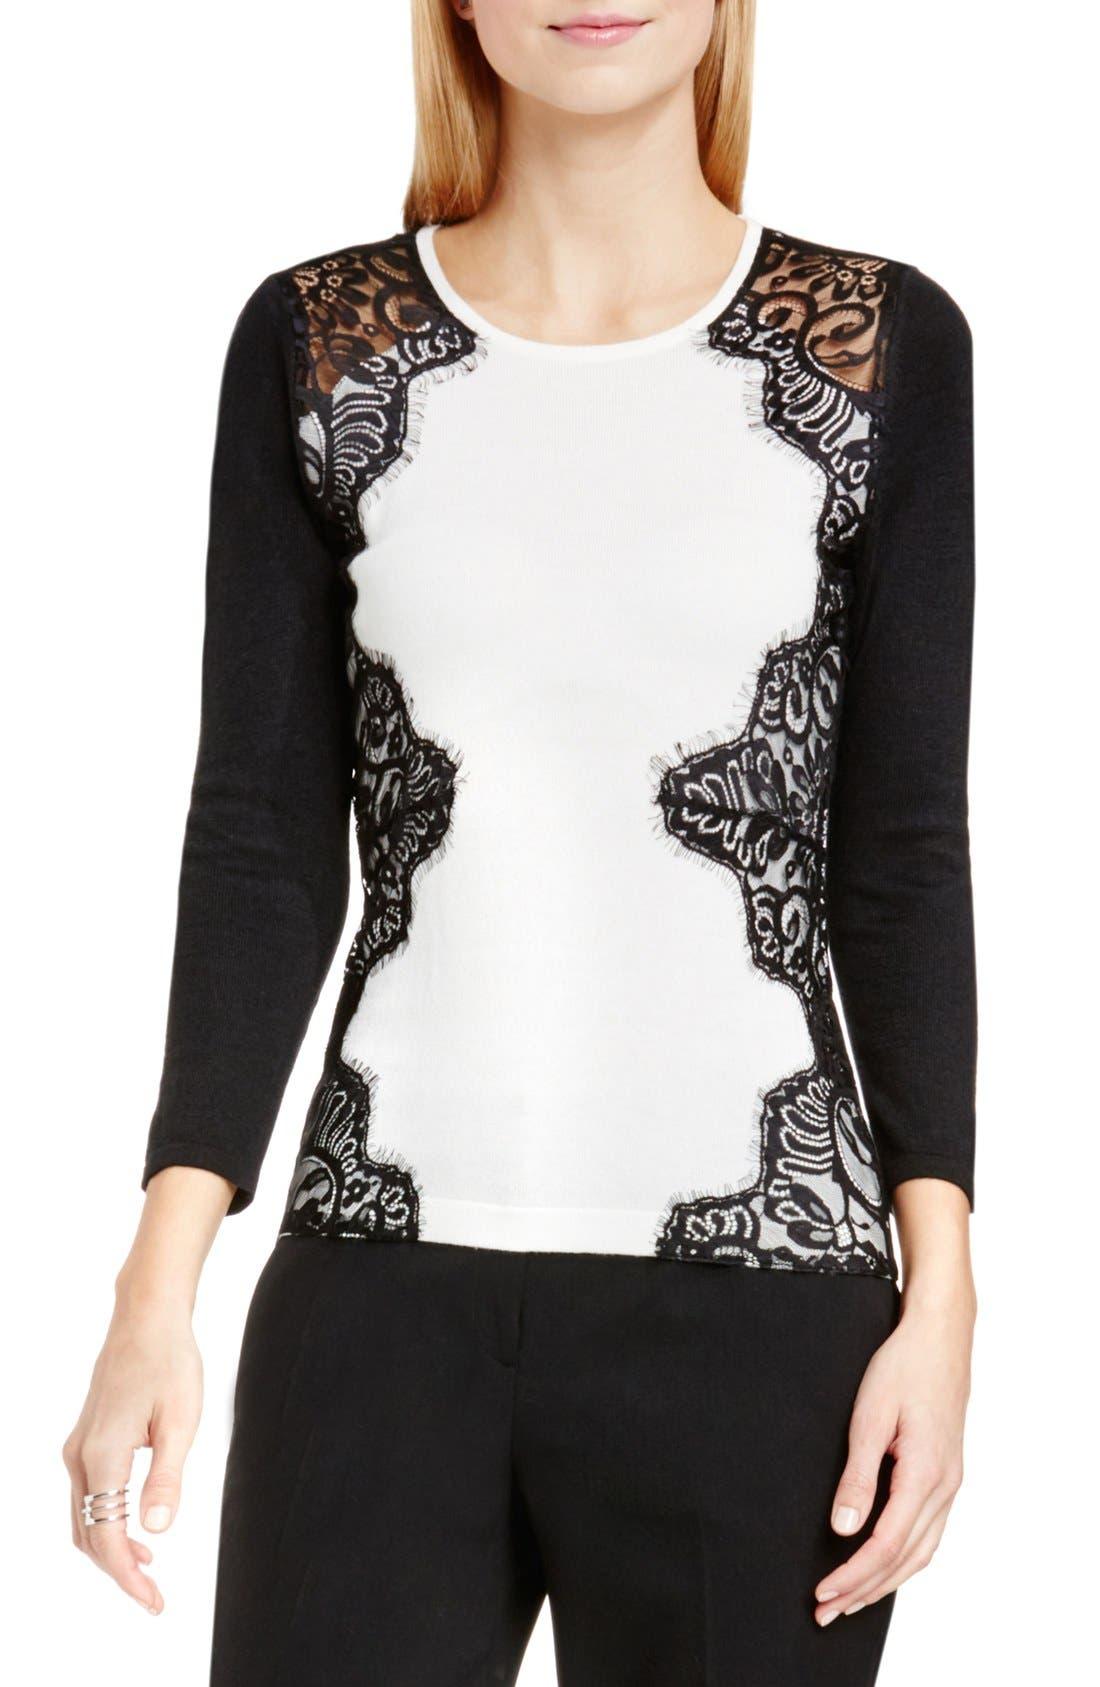 Alternate Image 1 Selected - Vince Camuto Side Lace Trim Sweater (Regular & Petite)